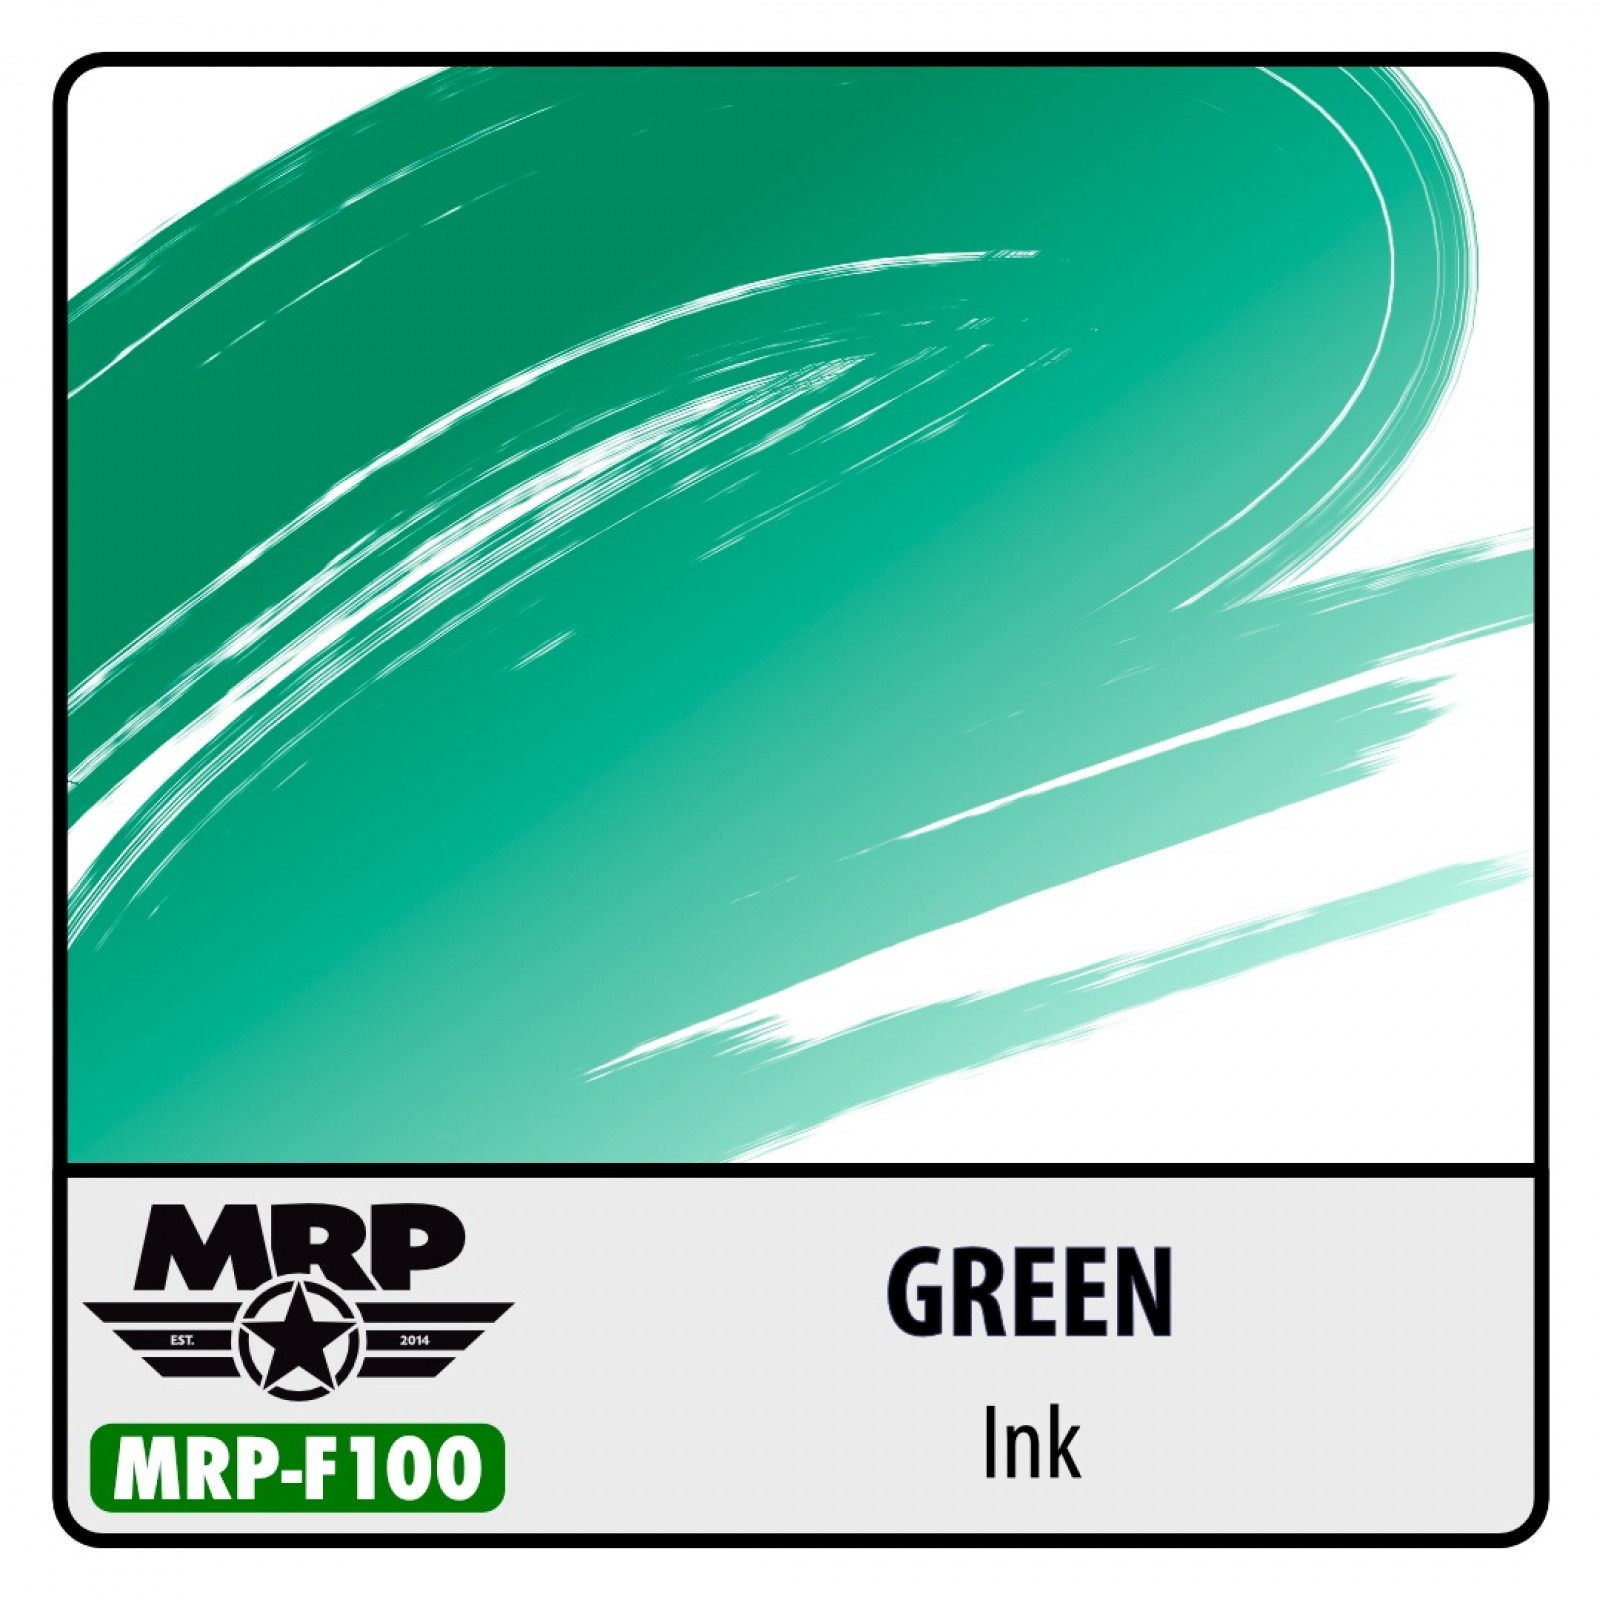 MRP-F100  GREEN - Ink